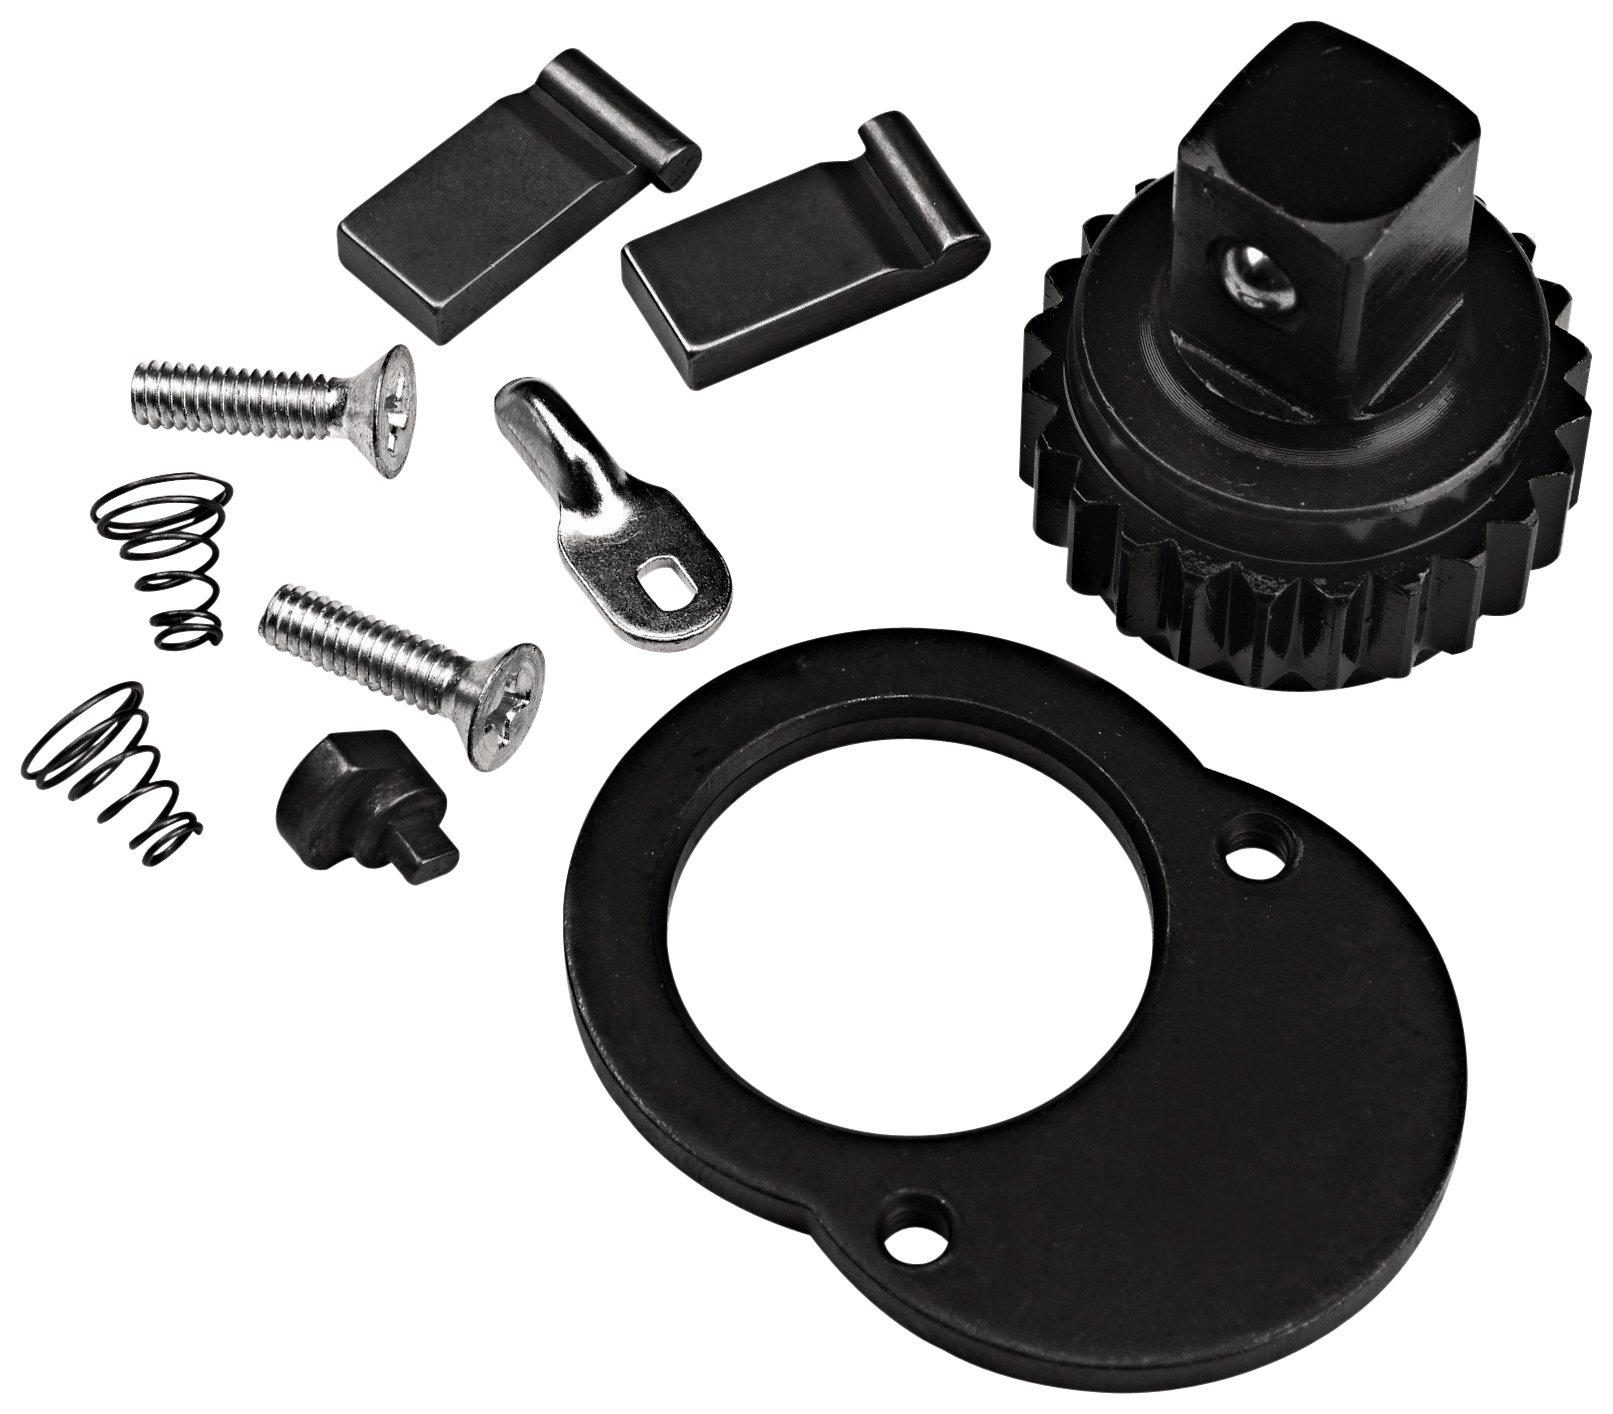 Stanley Proto J5449XLRK 1/2-Inch Drive Ratchet, Repair Kit J5449XL